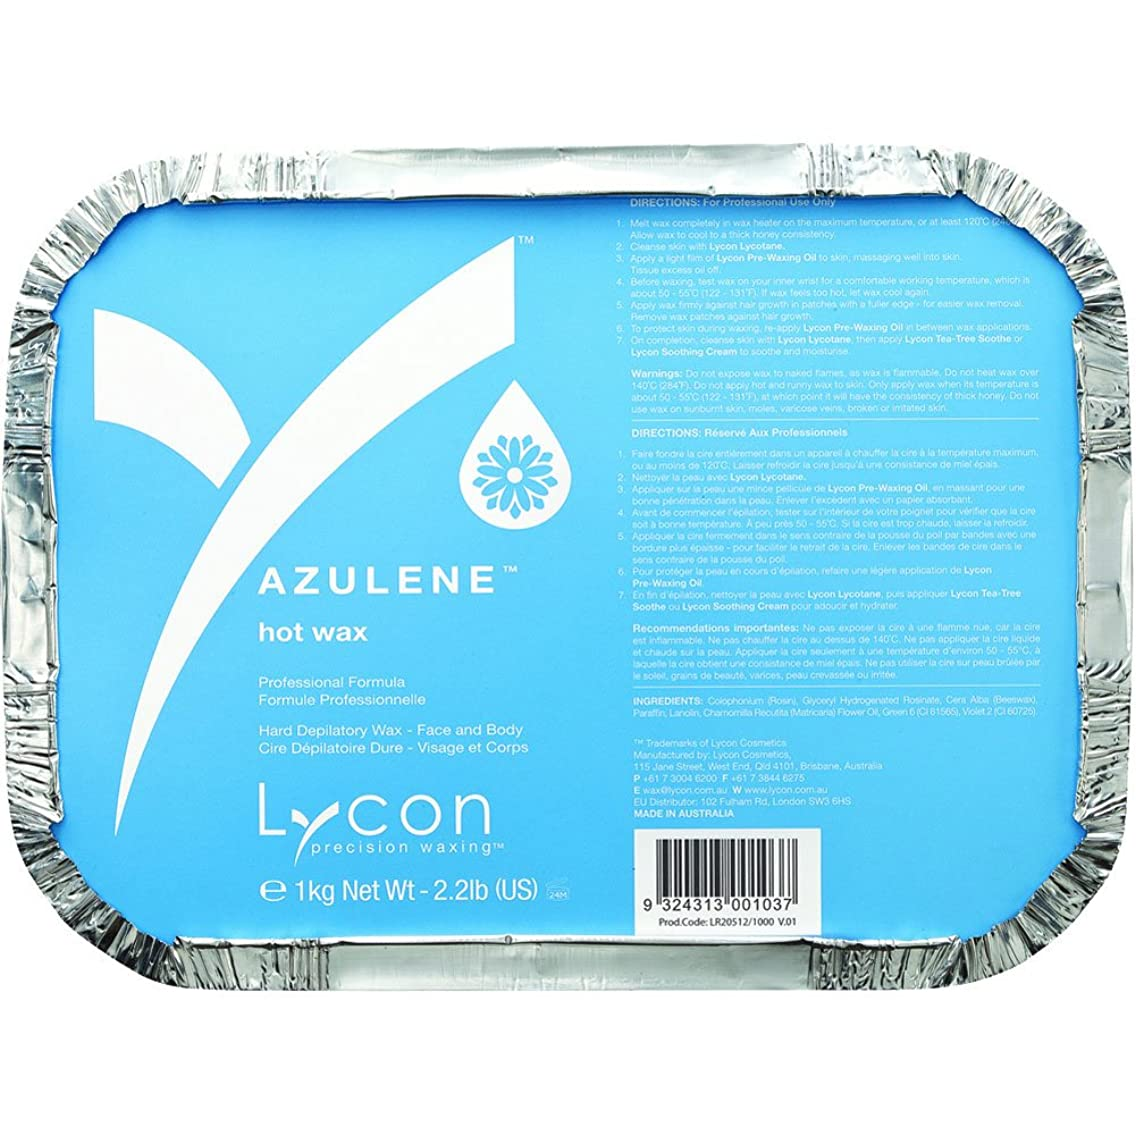 Lycon Azulene Hot Wax Stripless Hot Wax 35.3 oz